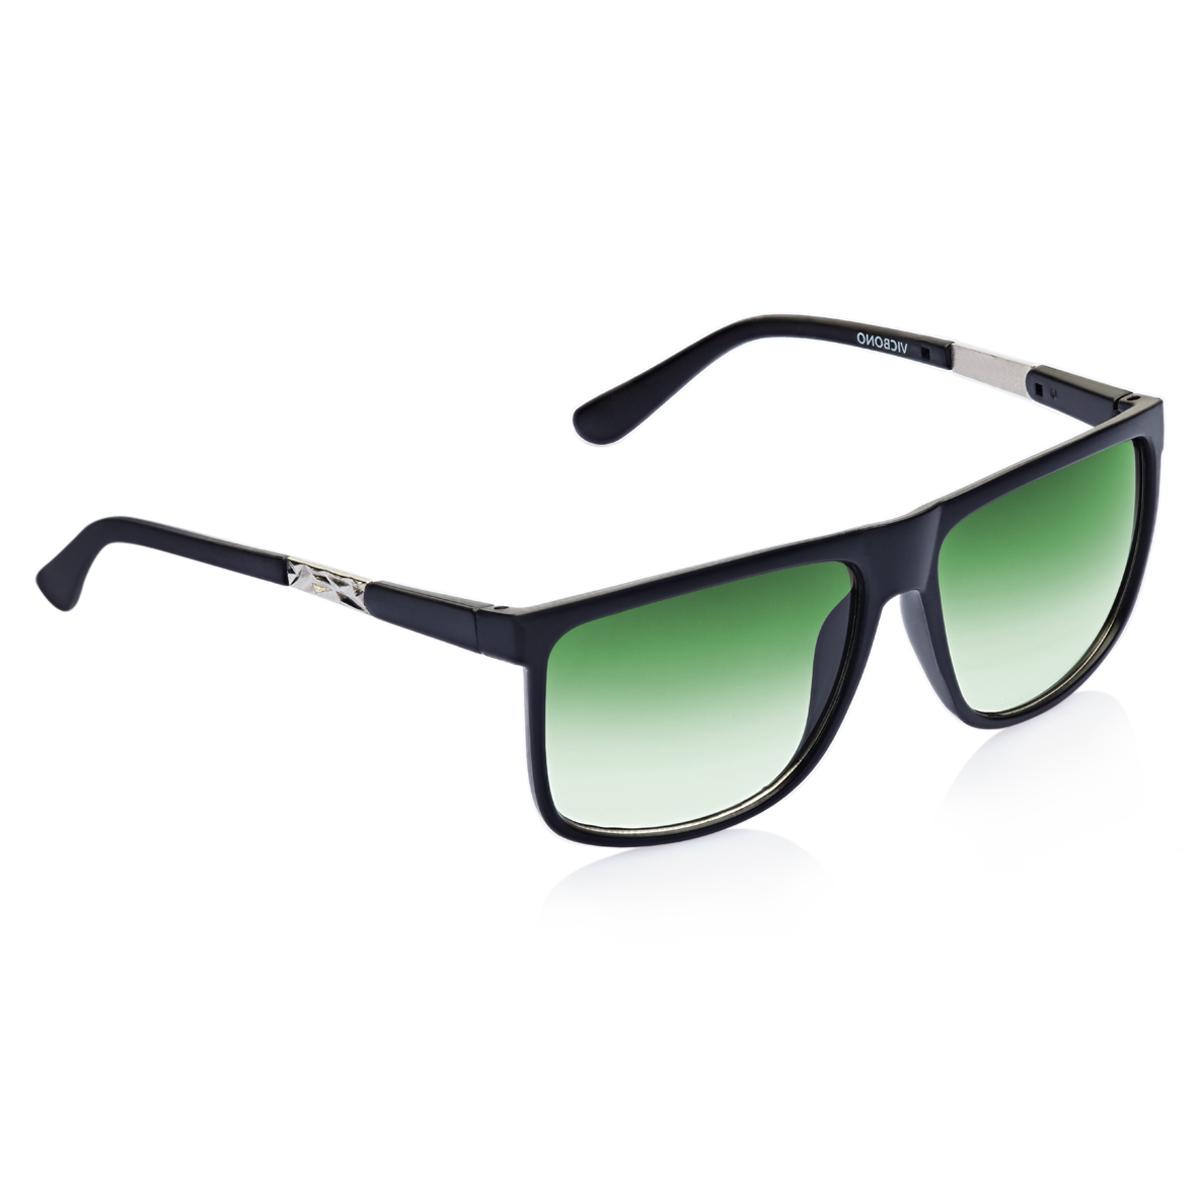 Vicbono Green Wayfarer UV Protection Sunglass For Men -VBSG-036